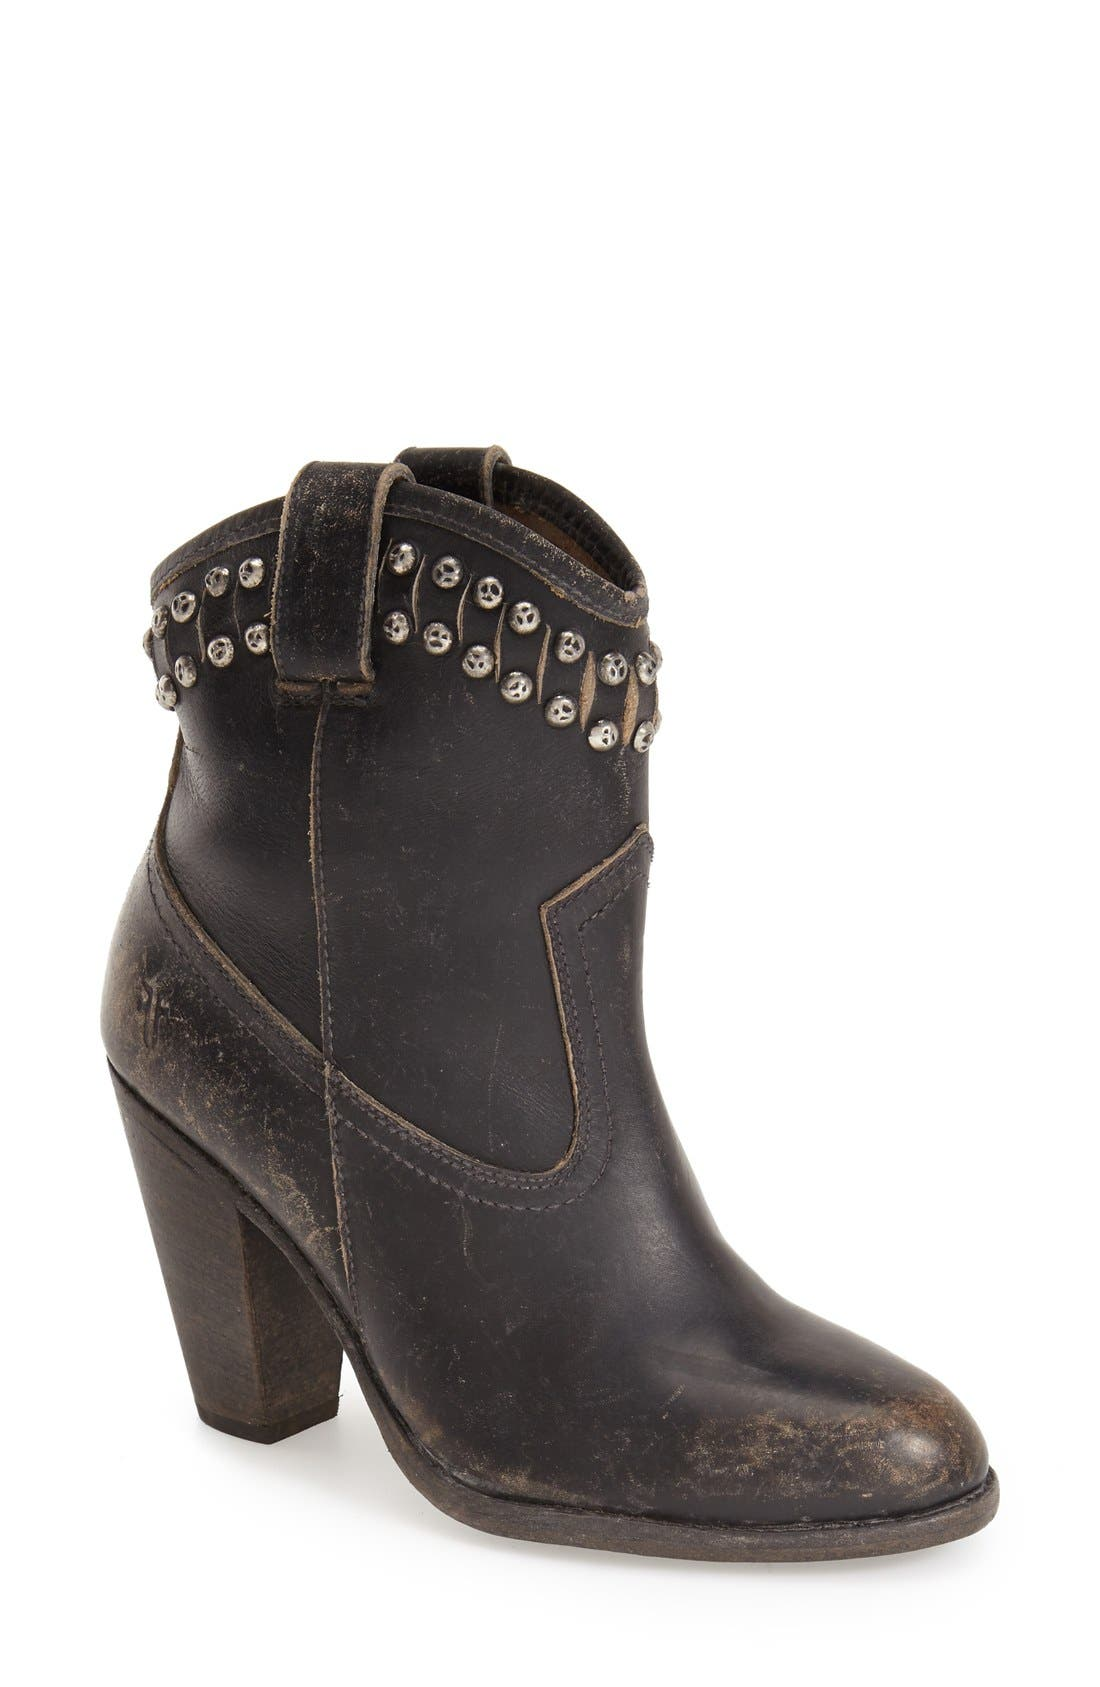 Main Image - Frye 'Jenny -Cut Stud' Short Boot (Women)